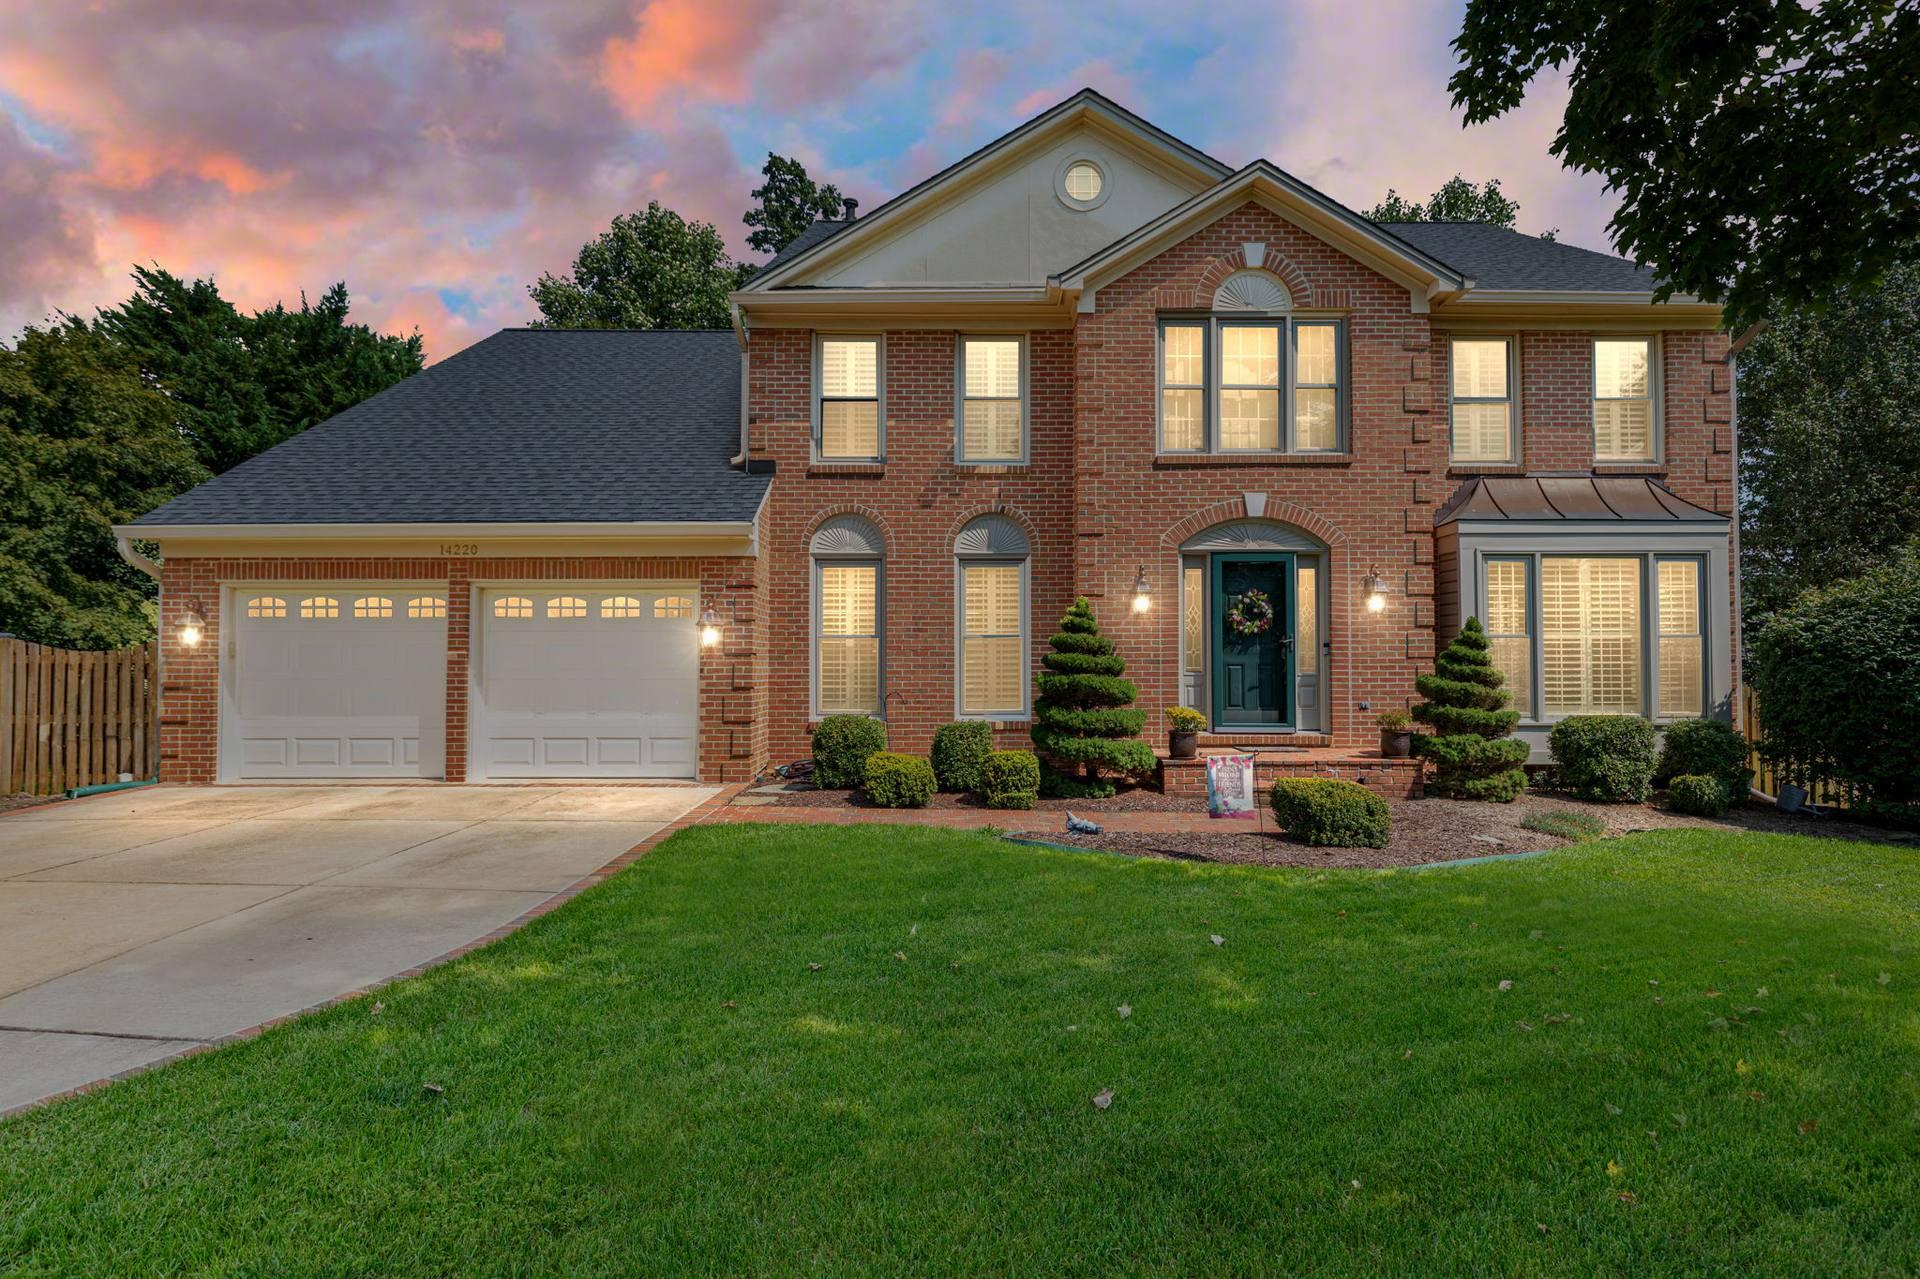 14220 Pony Hill Ct, Centreville, VA 20121, USA